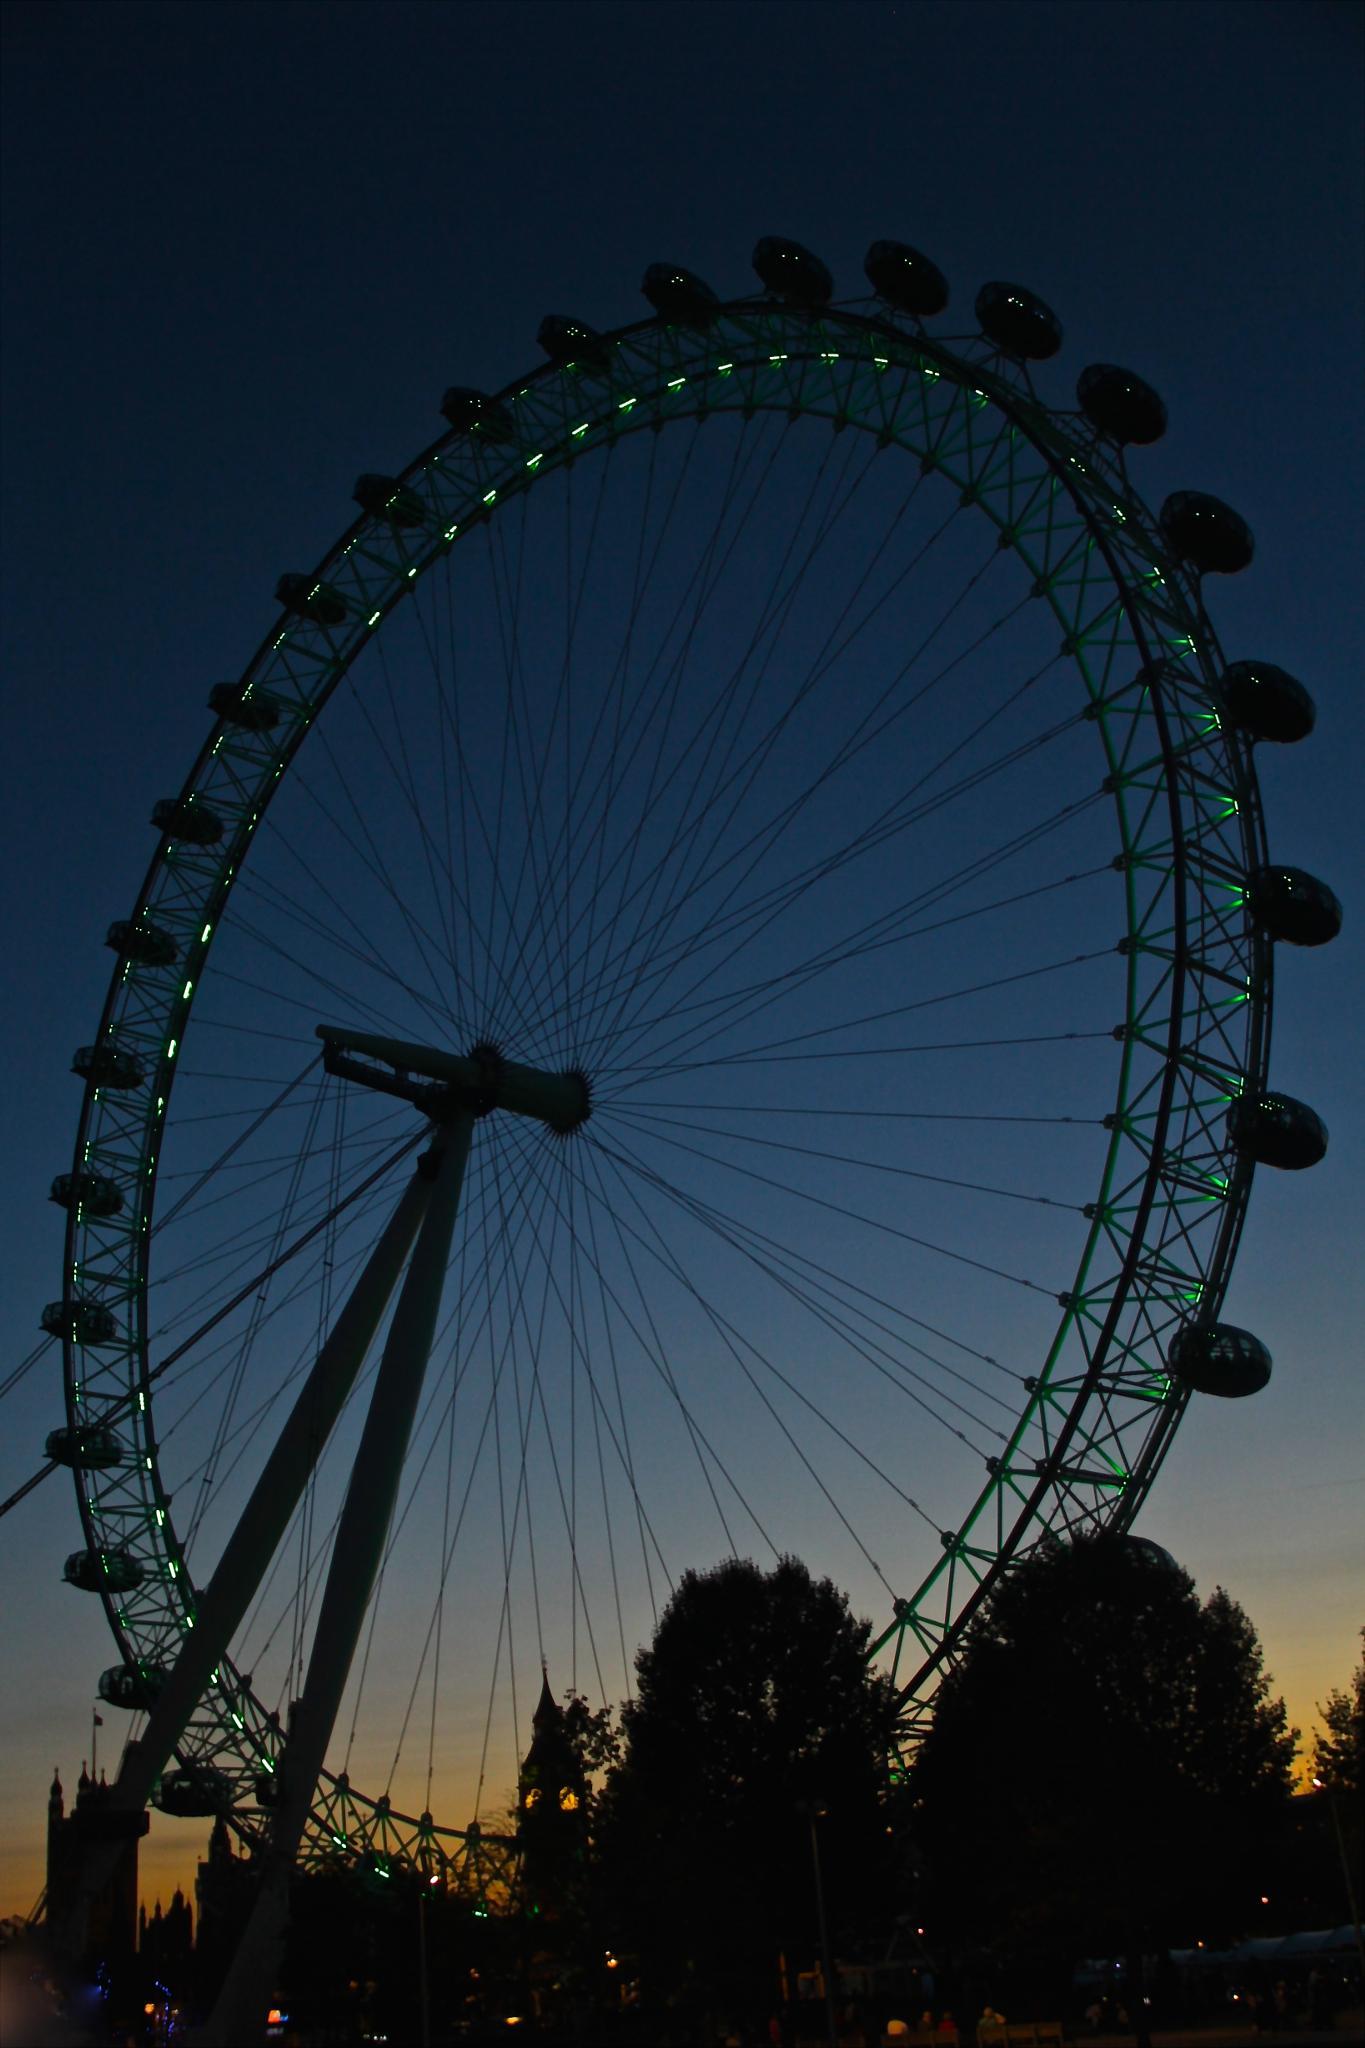 London Eye at Sunset by Jason R. Rich